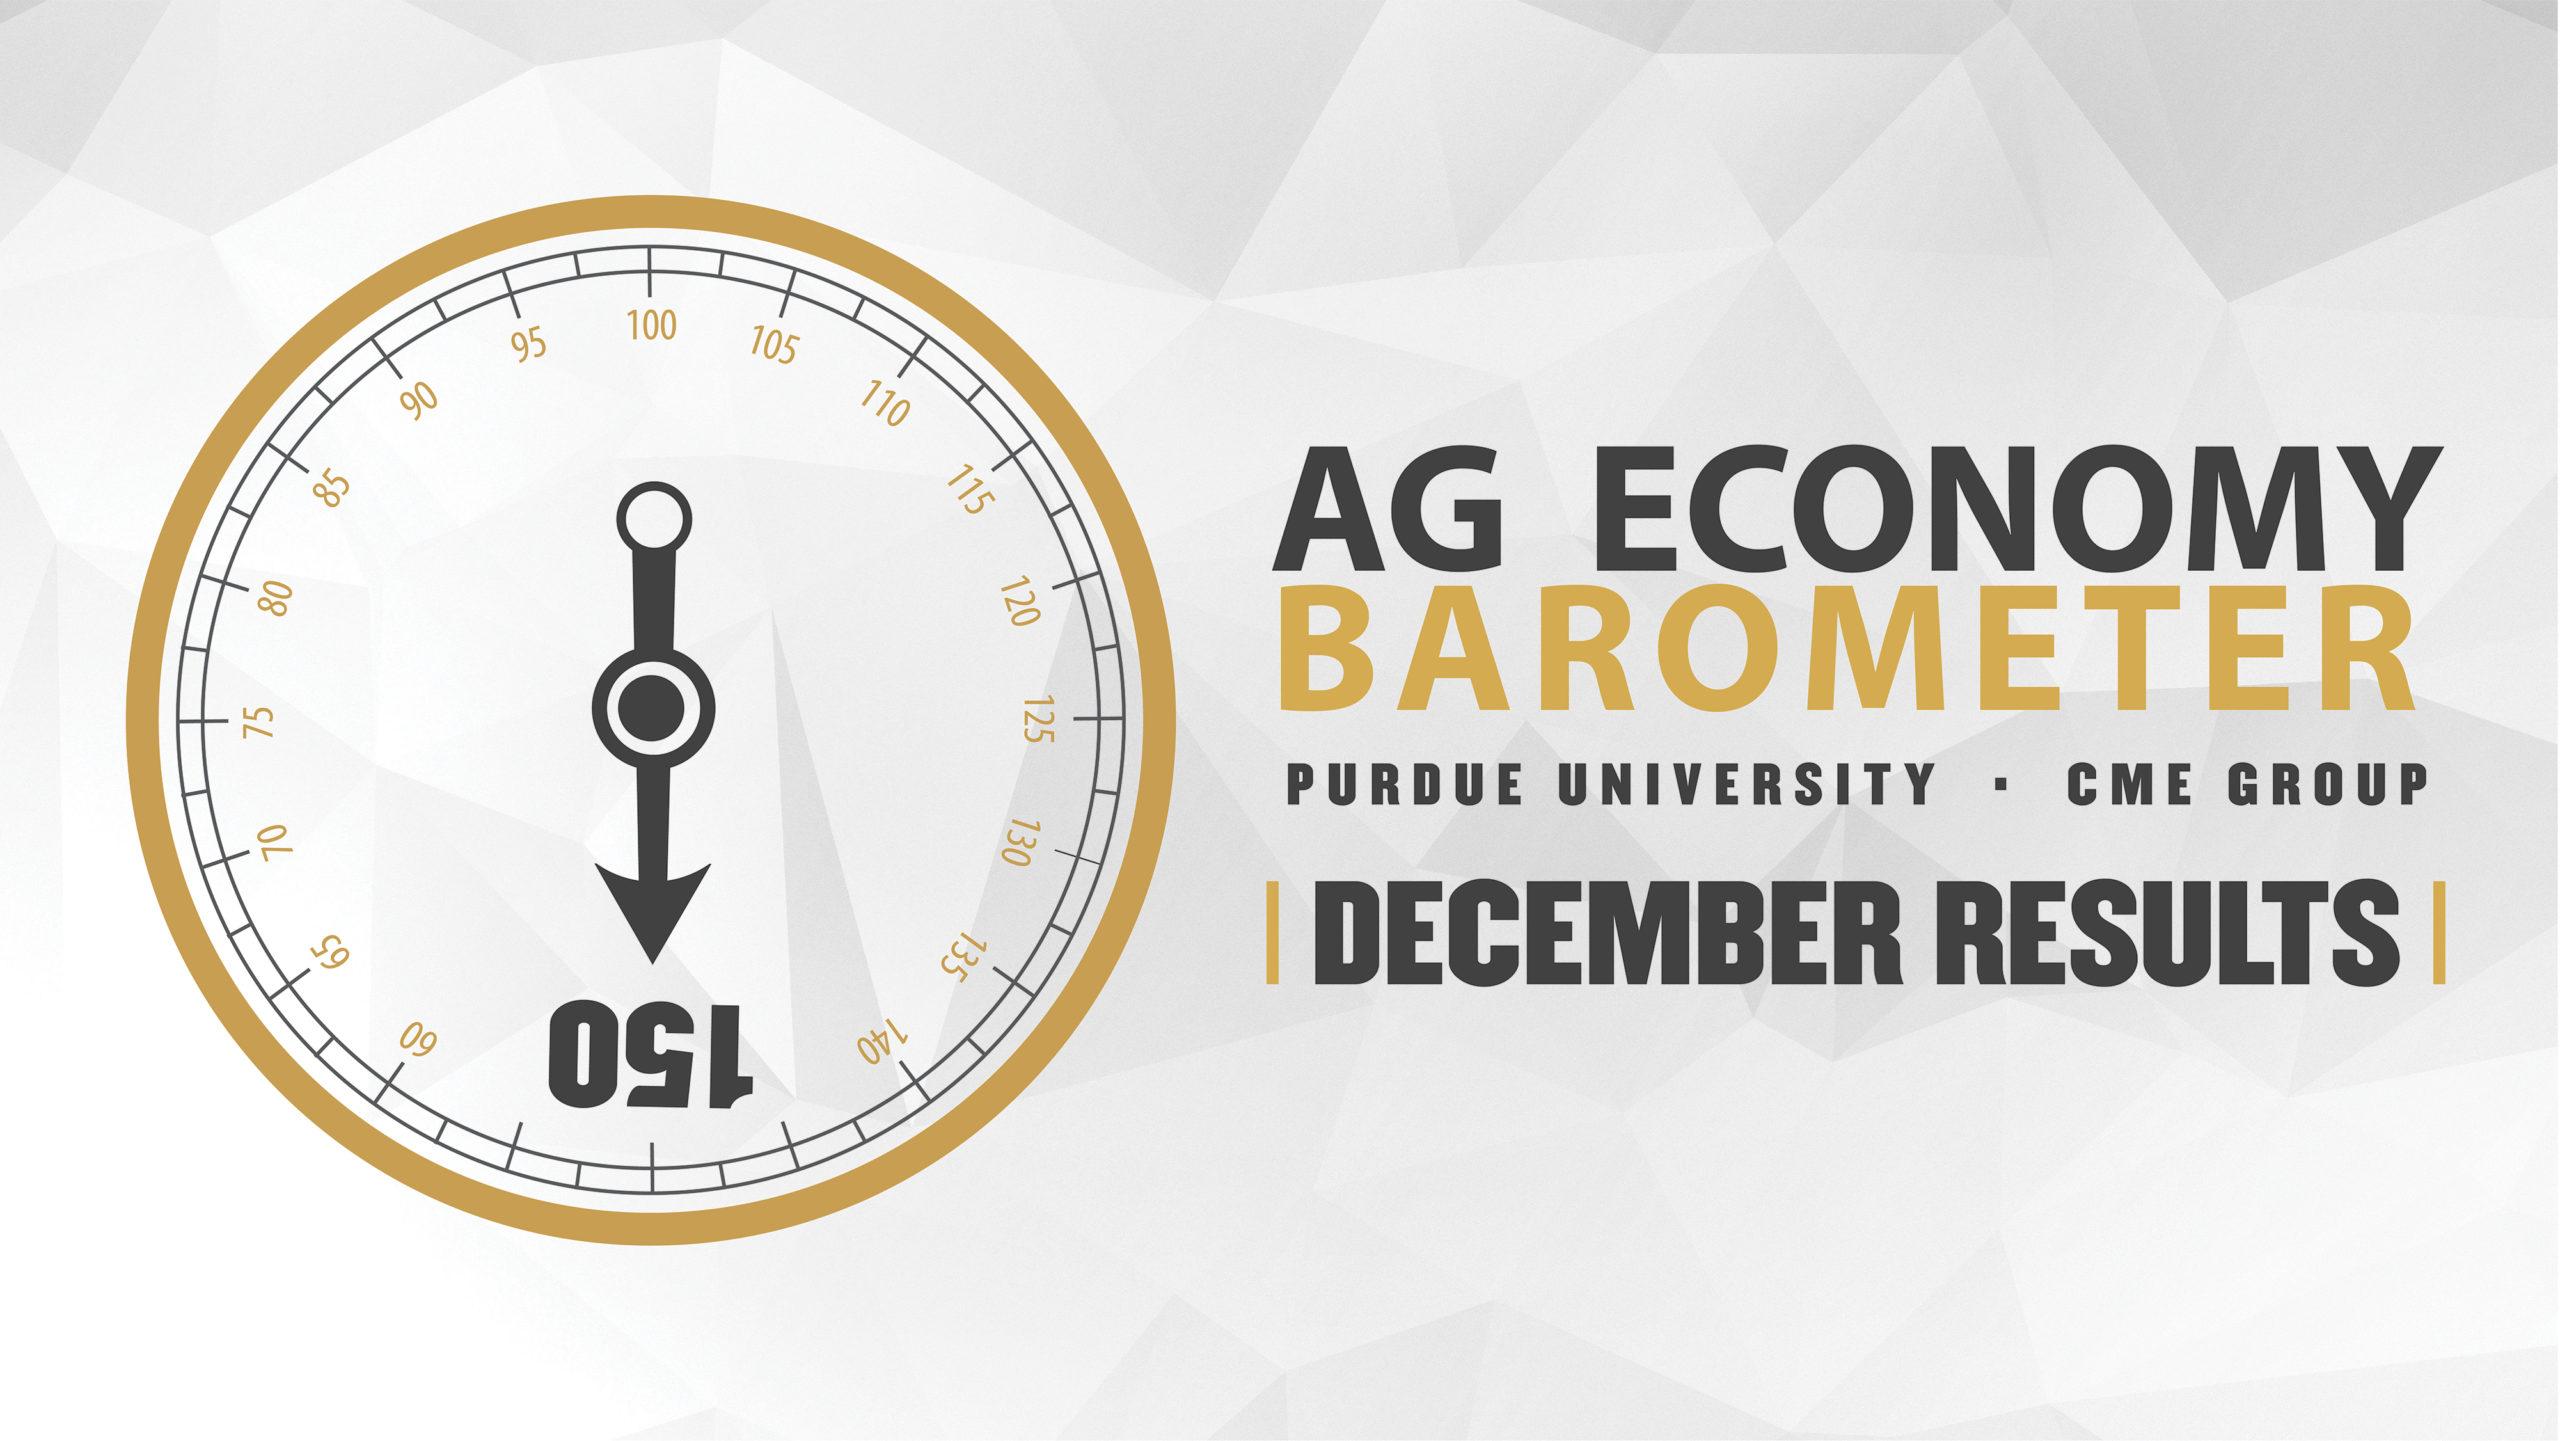 Ag Economy Barometer Widget December 2019: 150